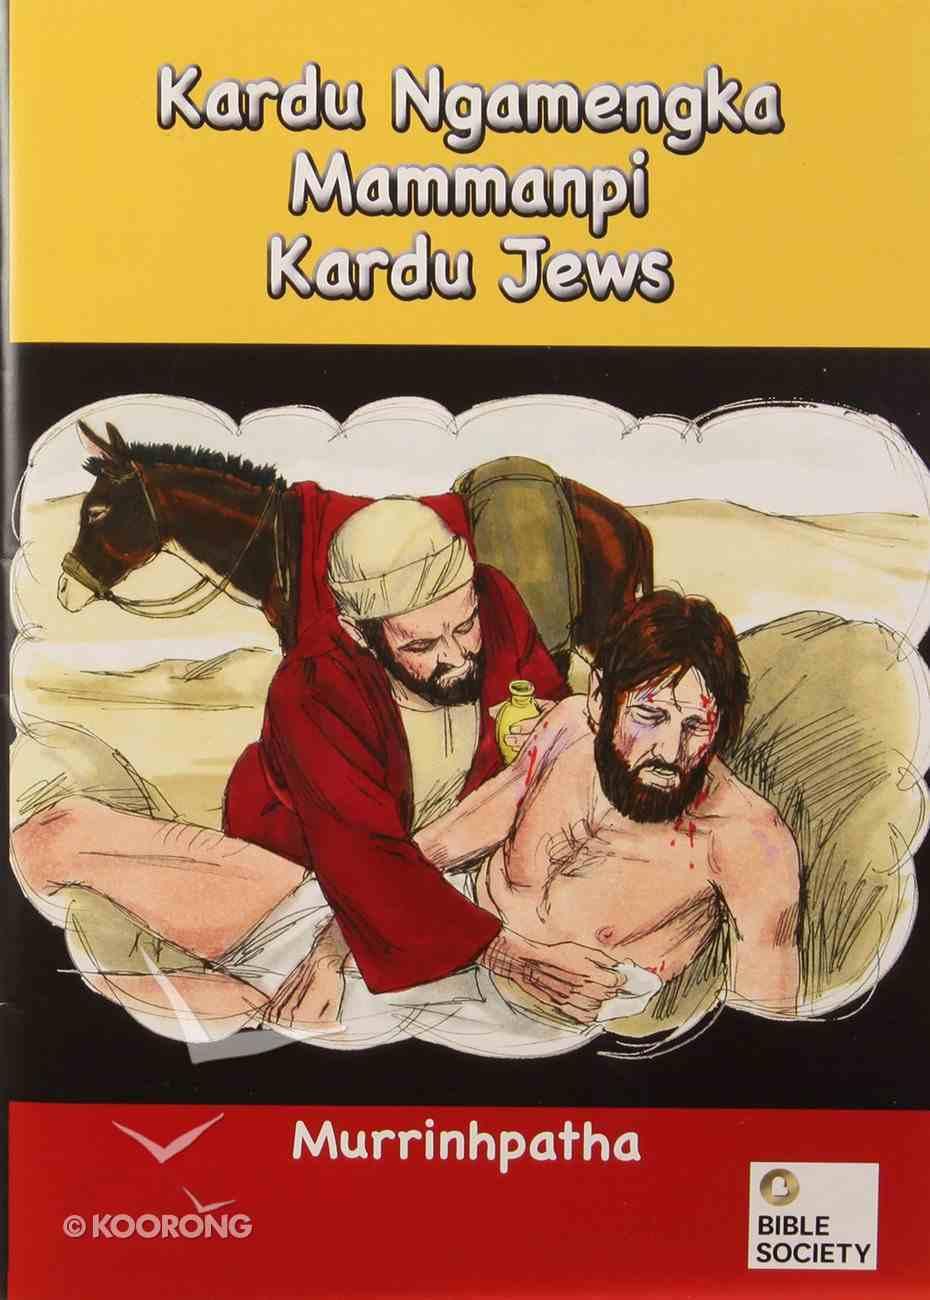 Murrinhpatha Jesus Walking on Water / a Stranger Helps a Jew Booklet